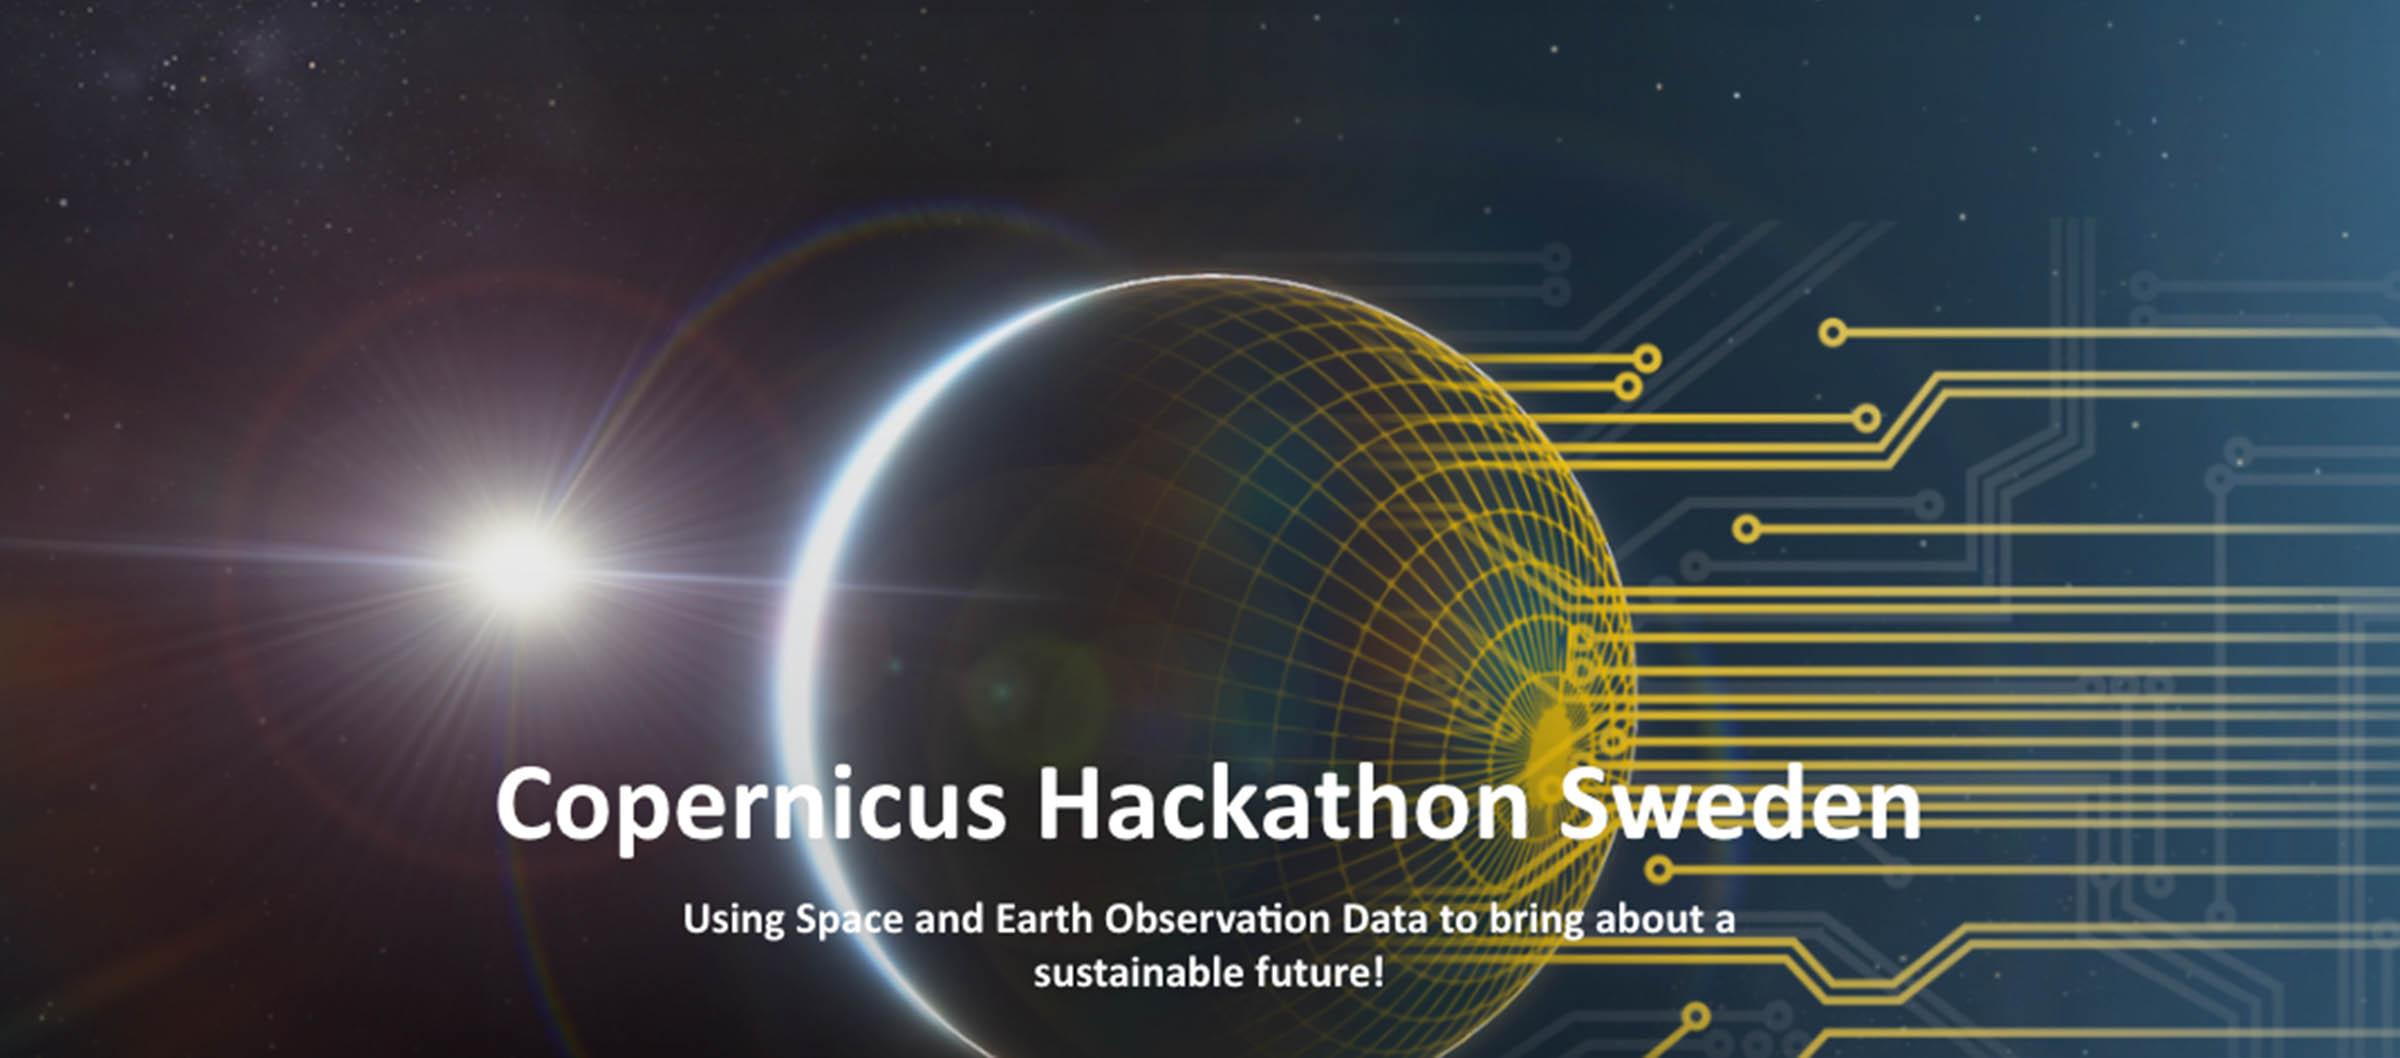 Copernicus Hackathon Sweden